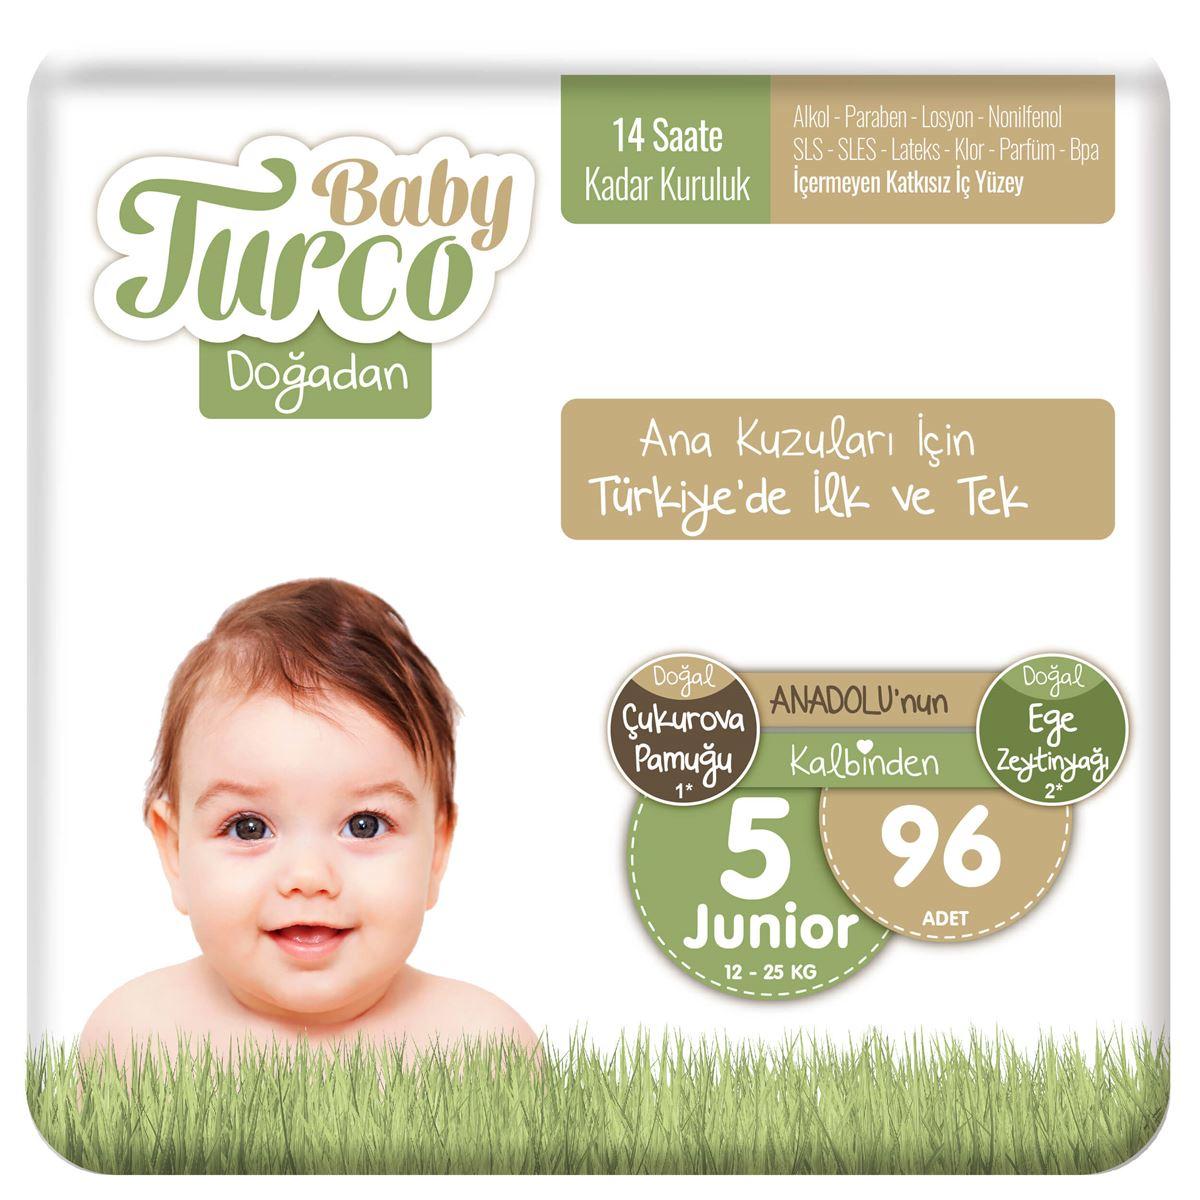 Baby Turco Doğadan 5 Numara Junıor 96 Adet